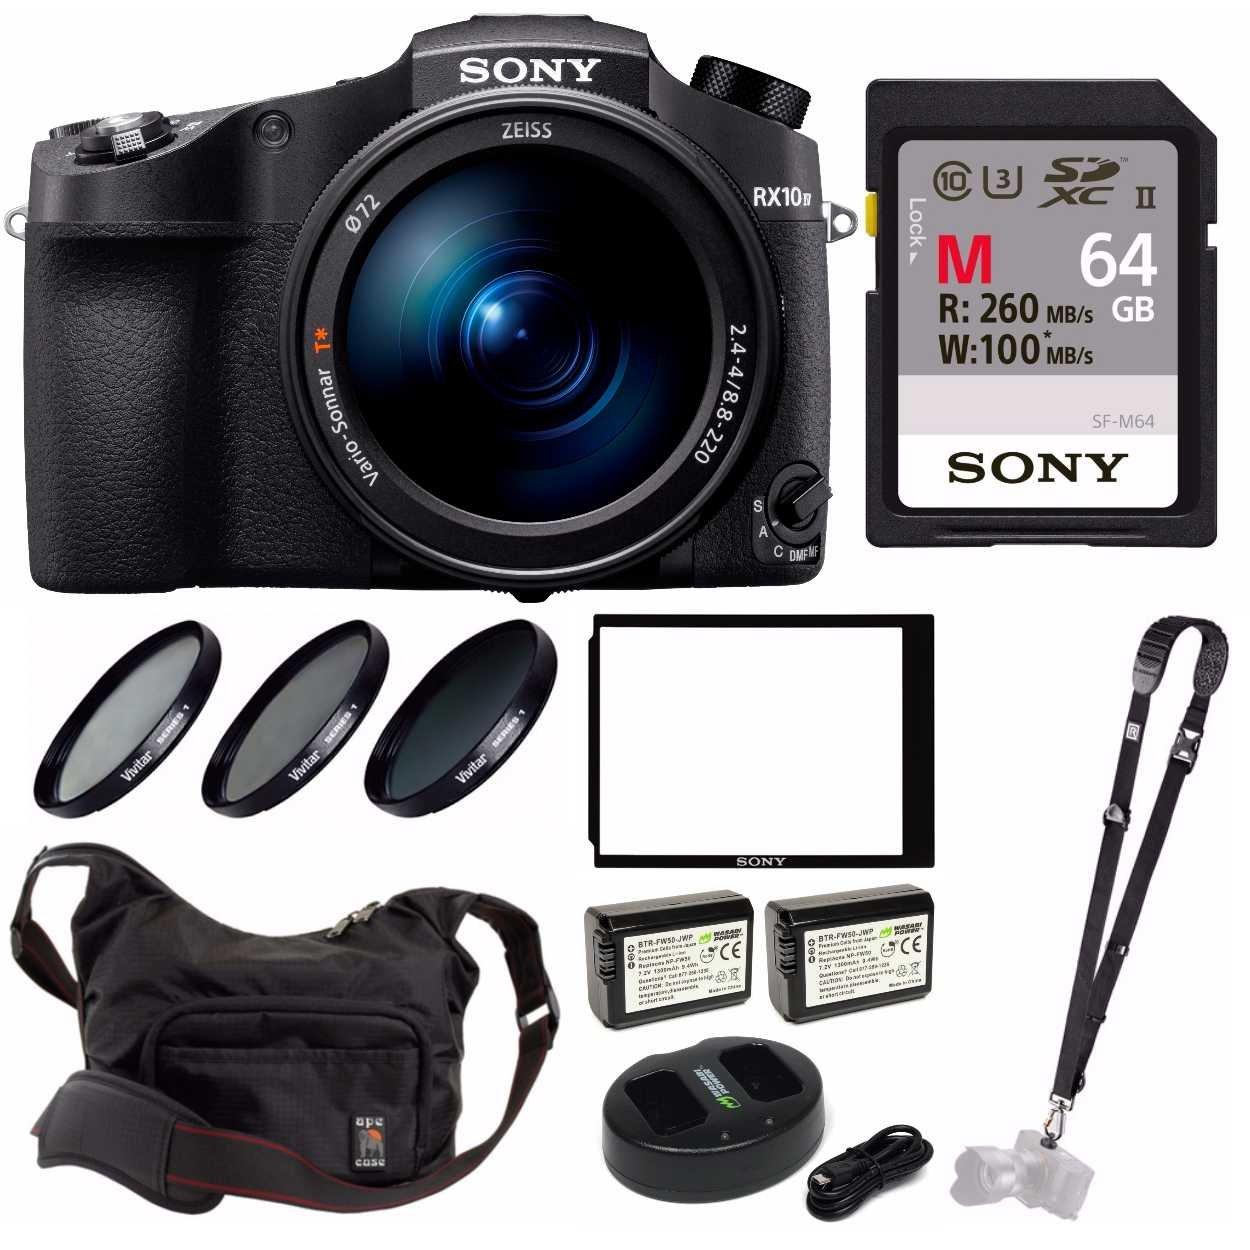 Sony Cyber‑Shot RX10 IV with 0 03 Second Auto-Focus & 25x Optical Zoom  (DSC-RX10M4) Pro Bundle (Sony 64GB M Ca